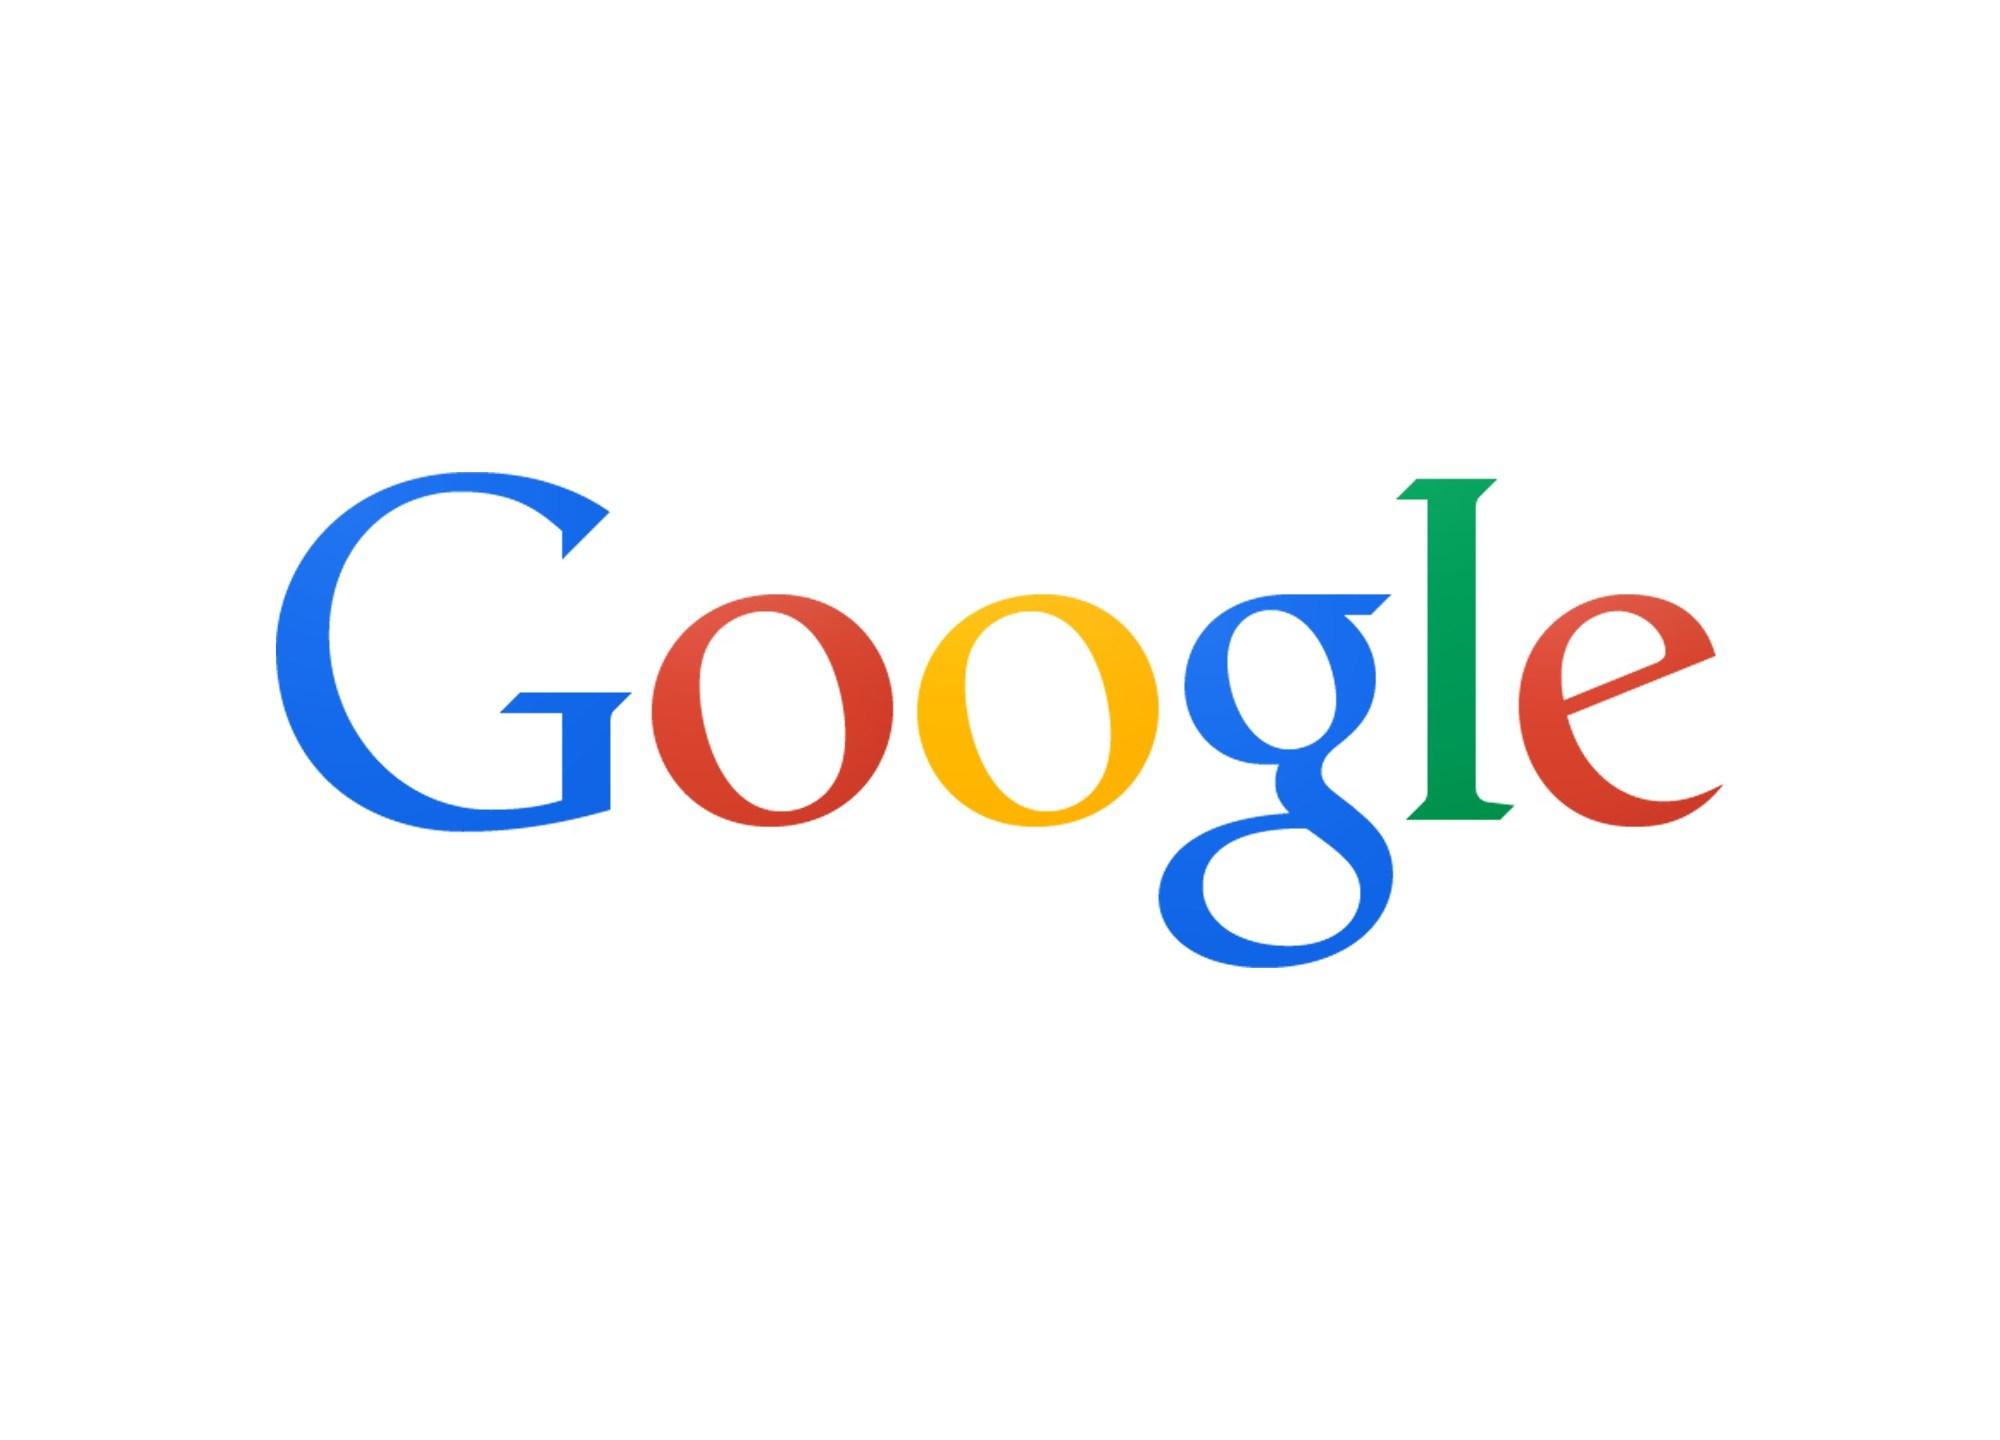 google logo_25284